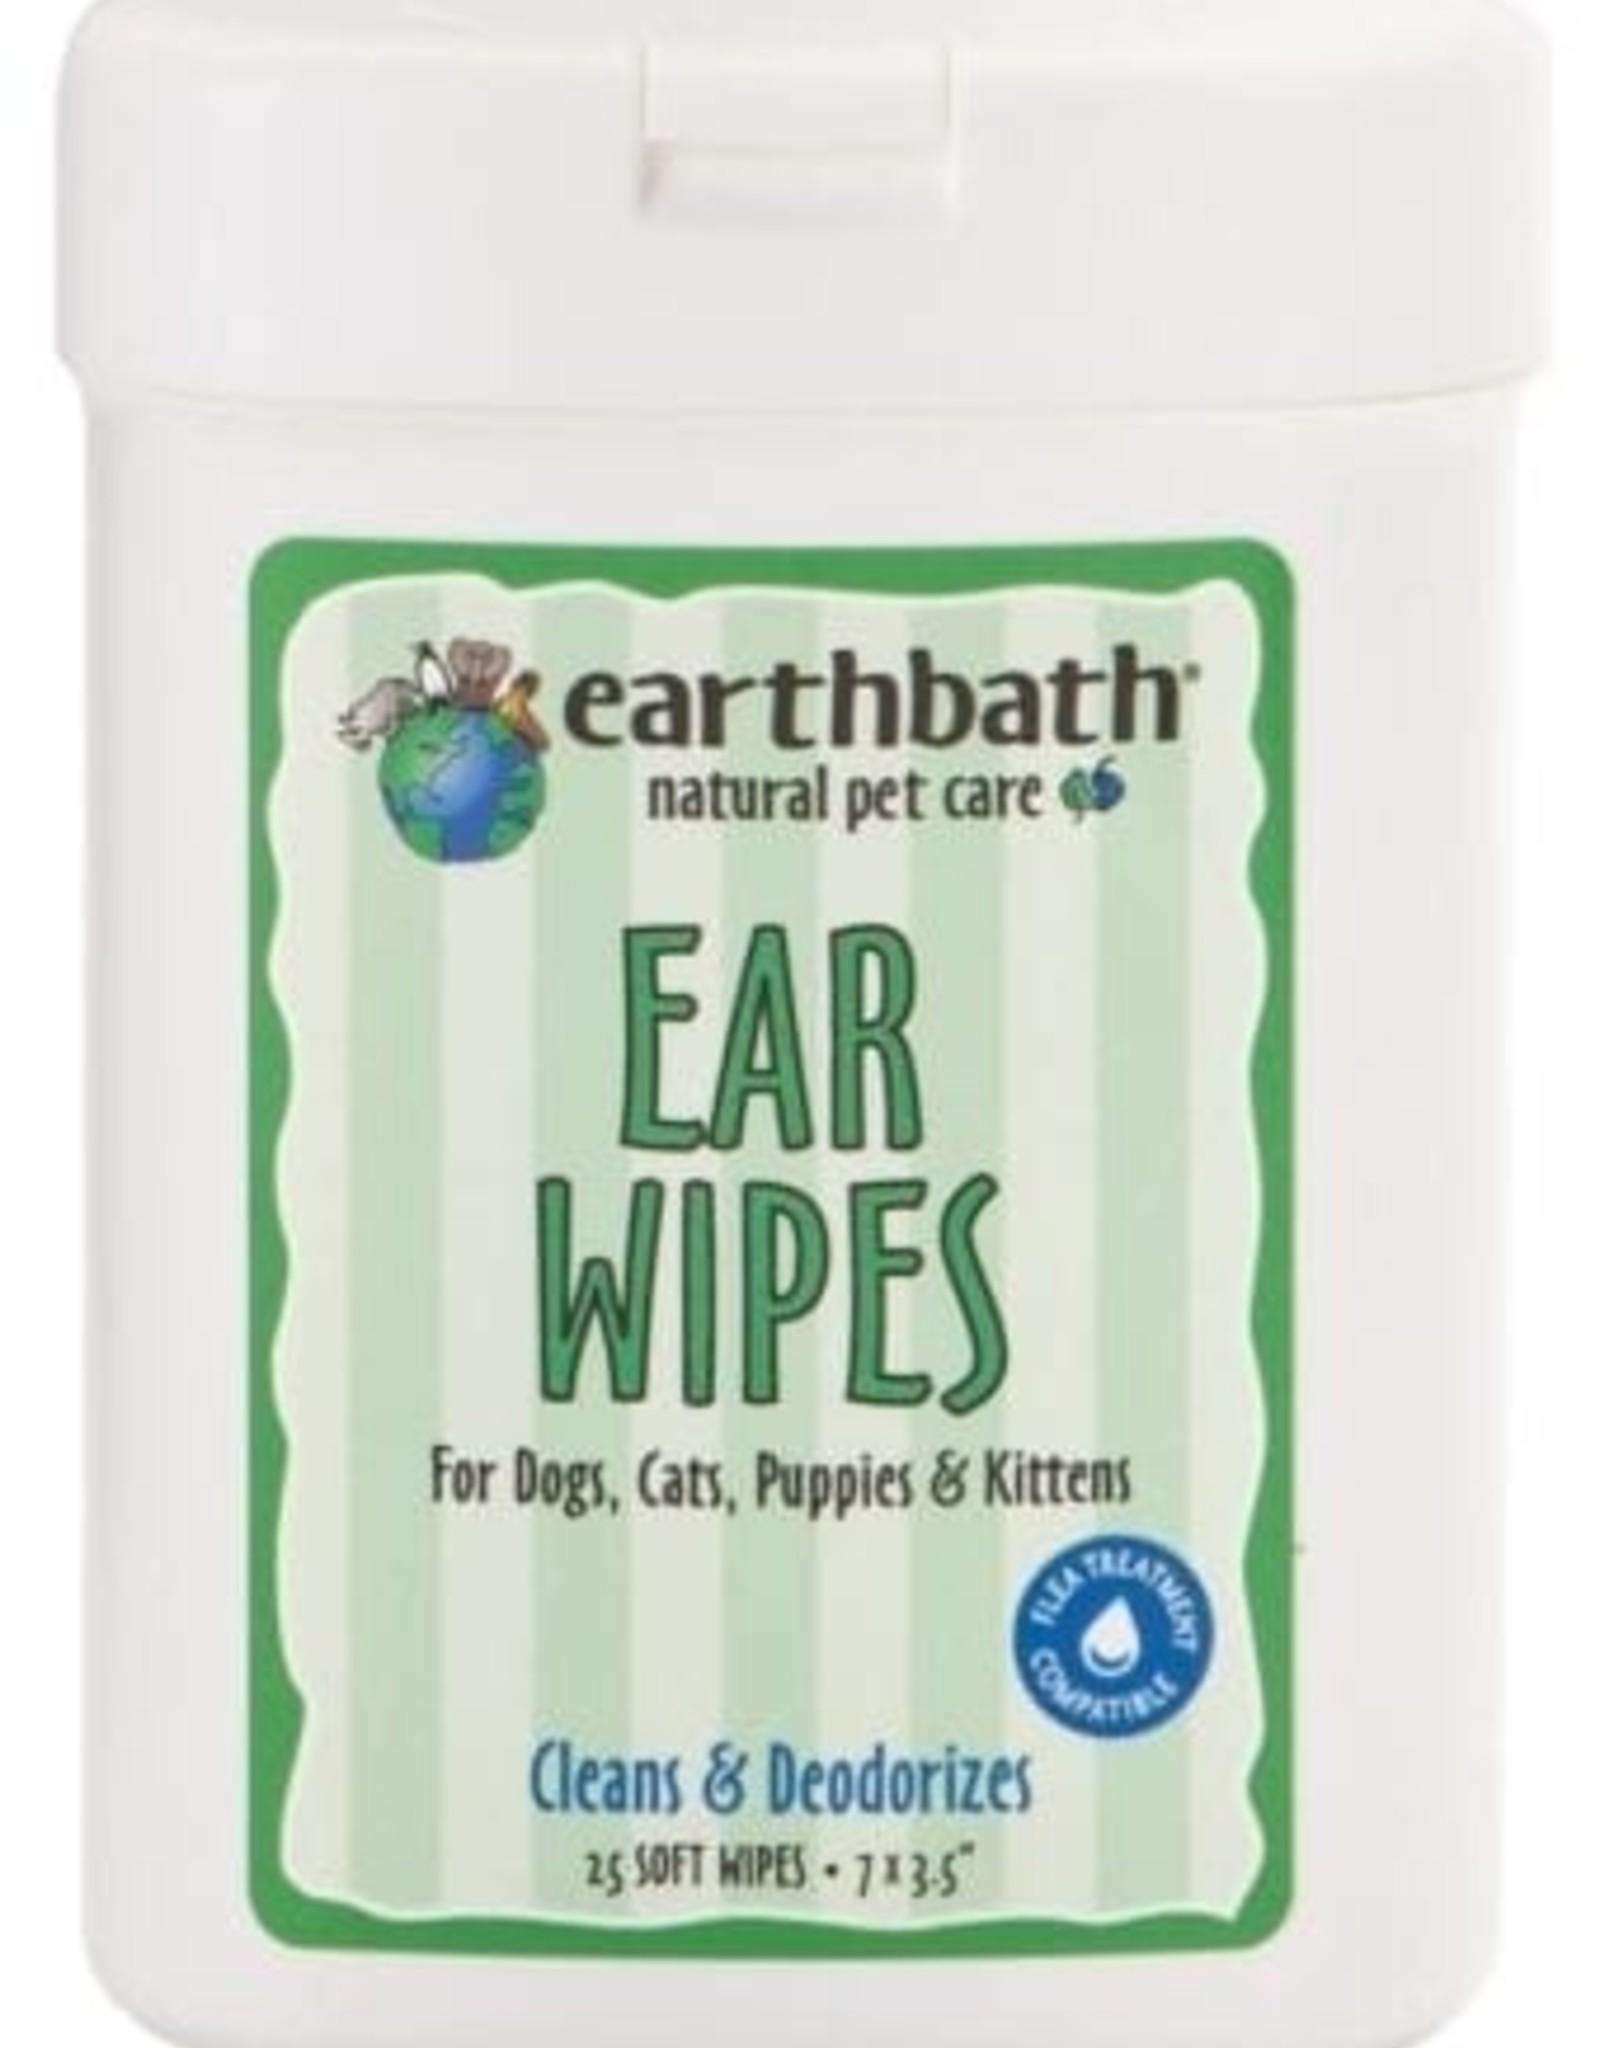 earthbath Ear Wipes - 25ct